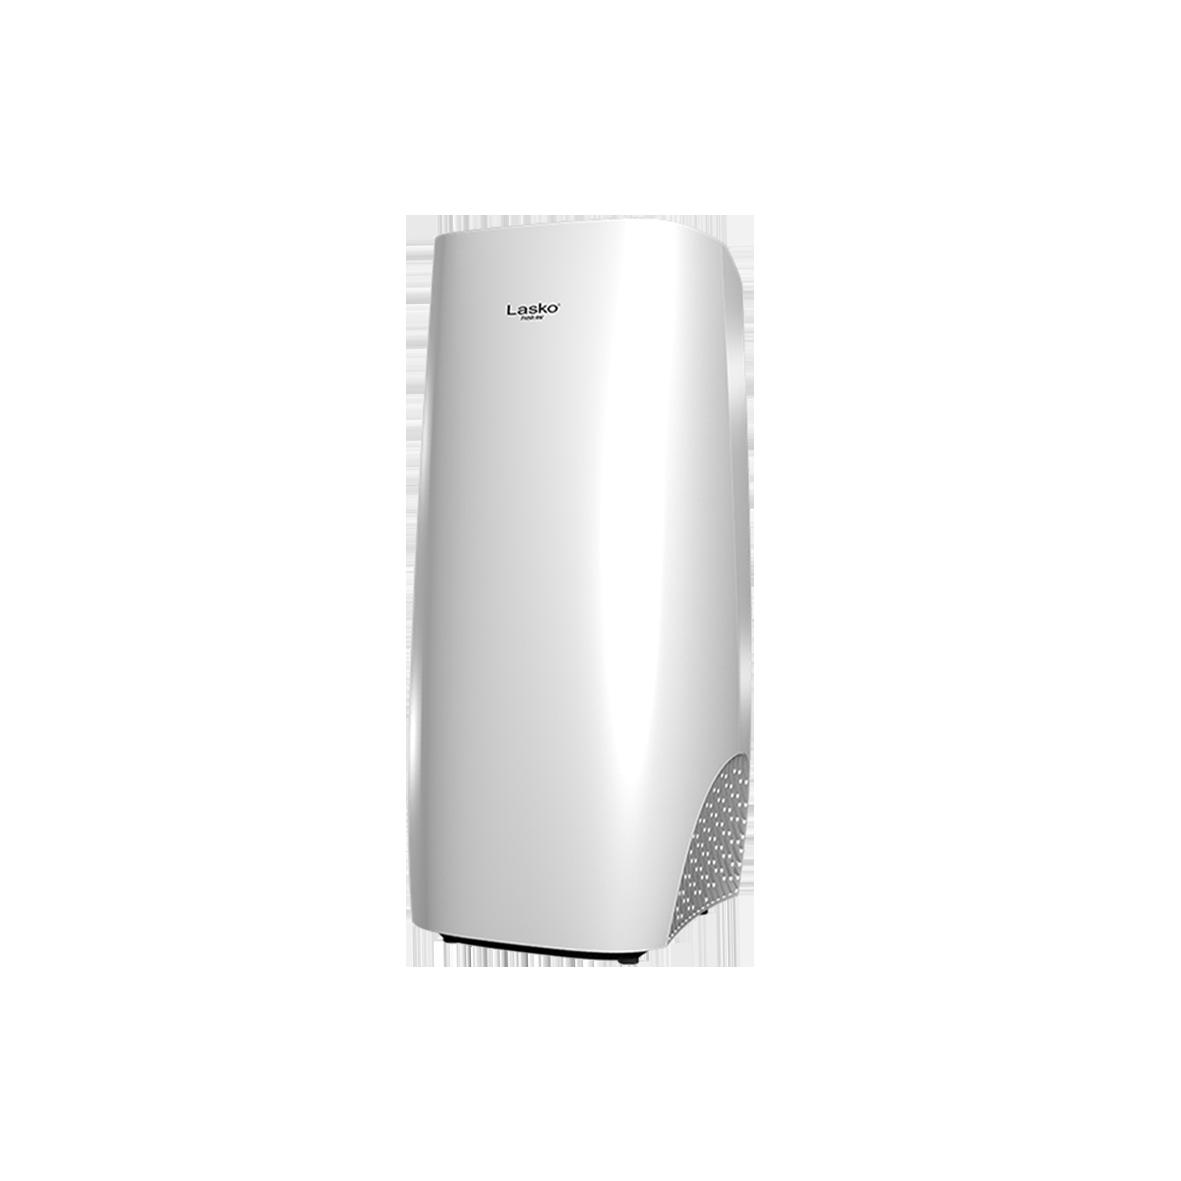 LASKO / 白淨峰Classic 高效節能空氣清淨機(HF2162)